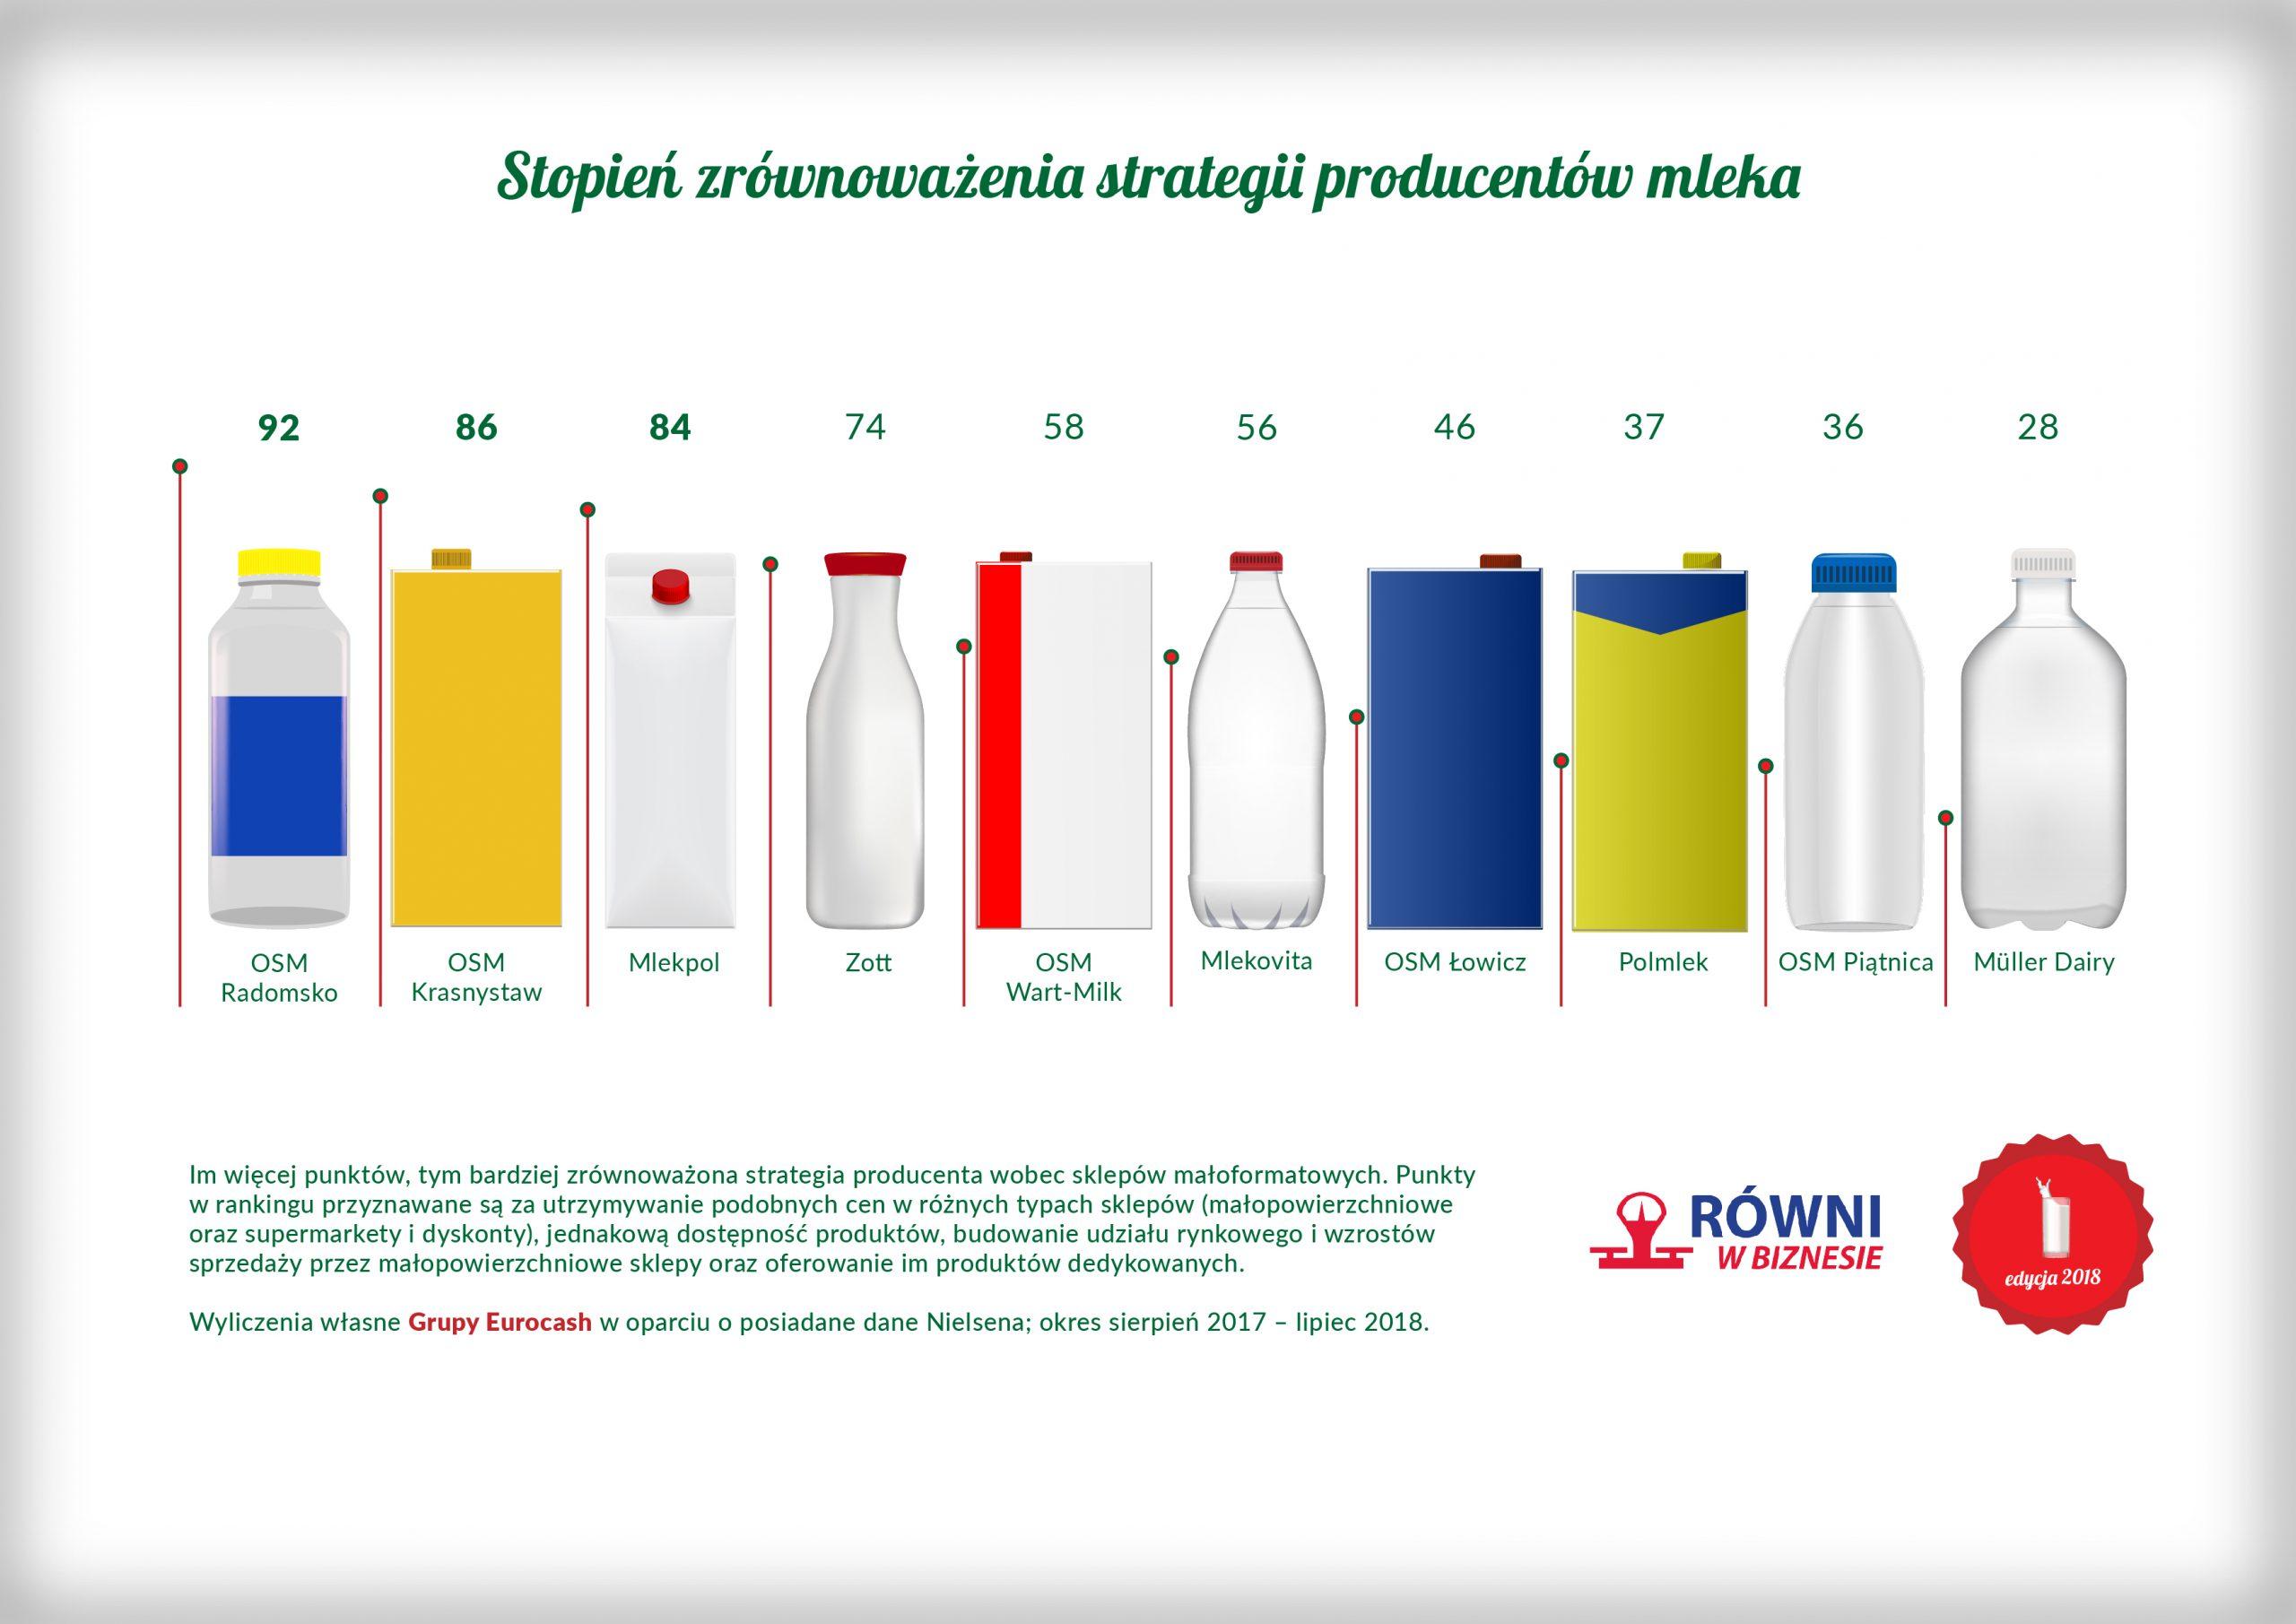 Ranking Równi w Biznesie: mleko